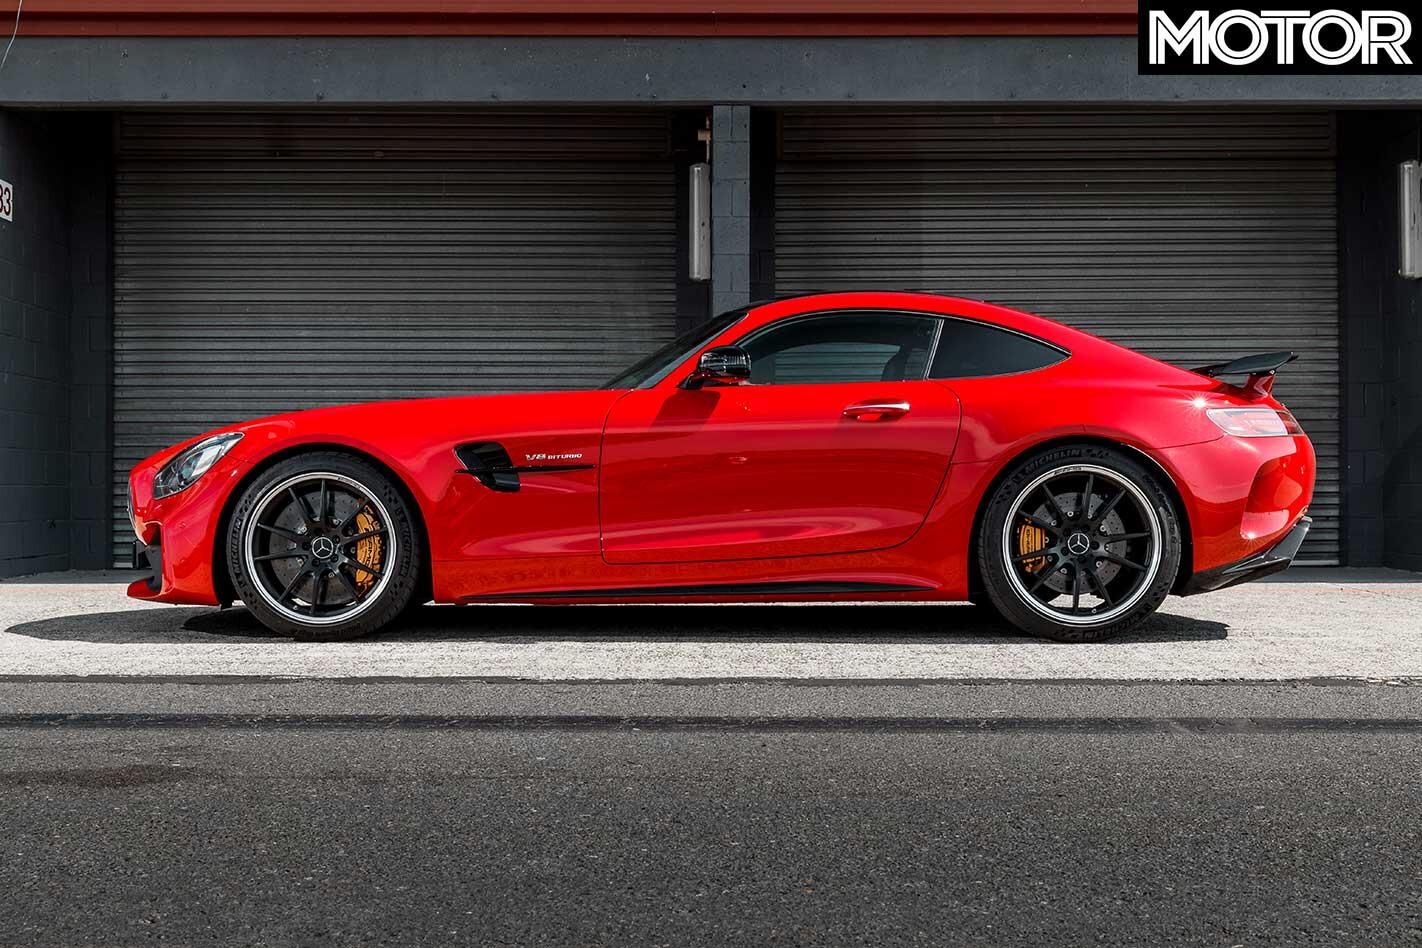 2019 Mercedes AMG GT R 12 Hours Review Sandown Raceway Pit Lane Jpg